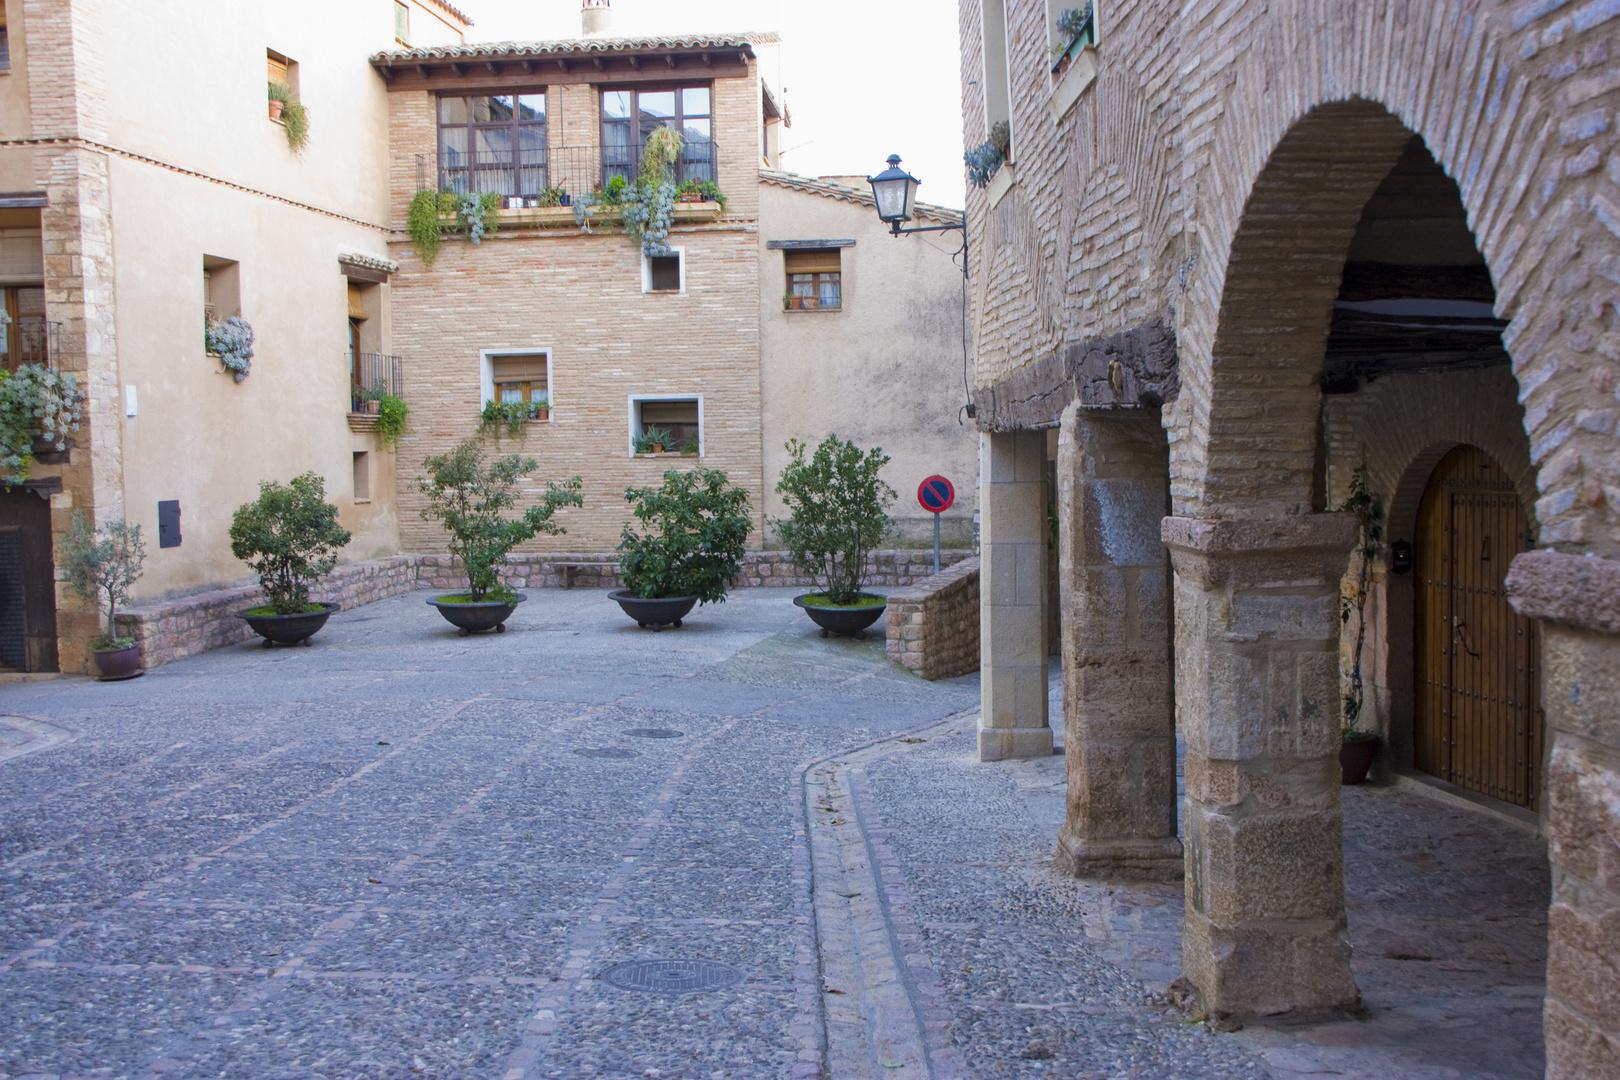 Alquezar (Huesca) 7